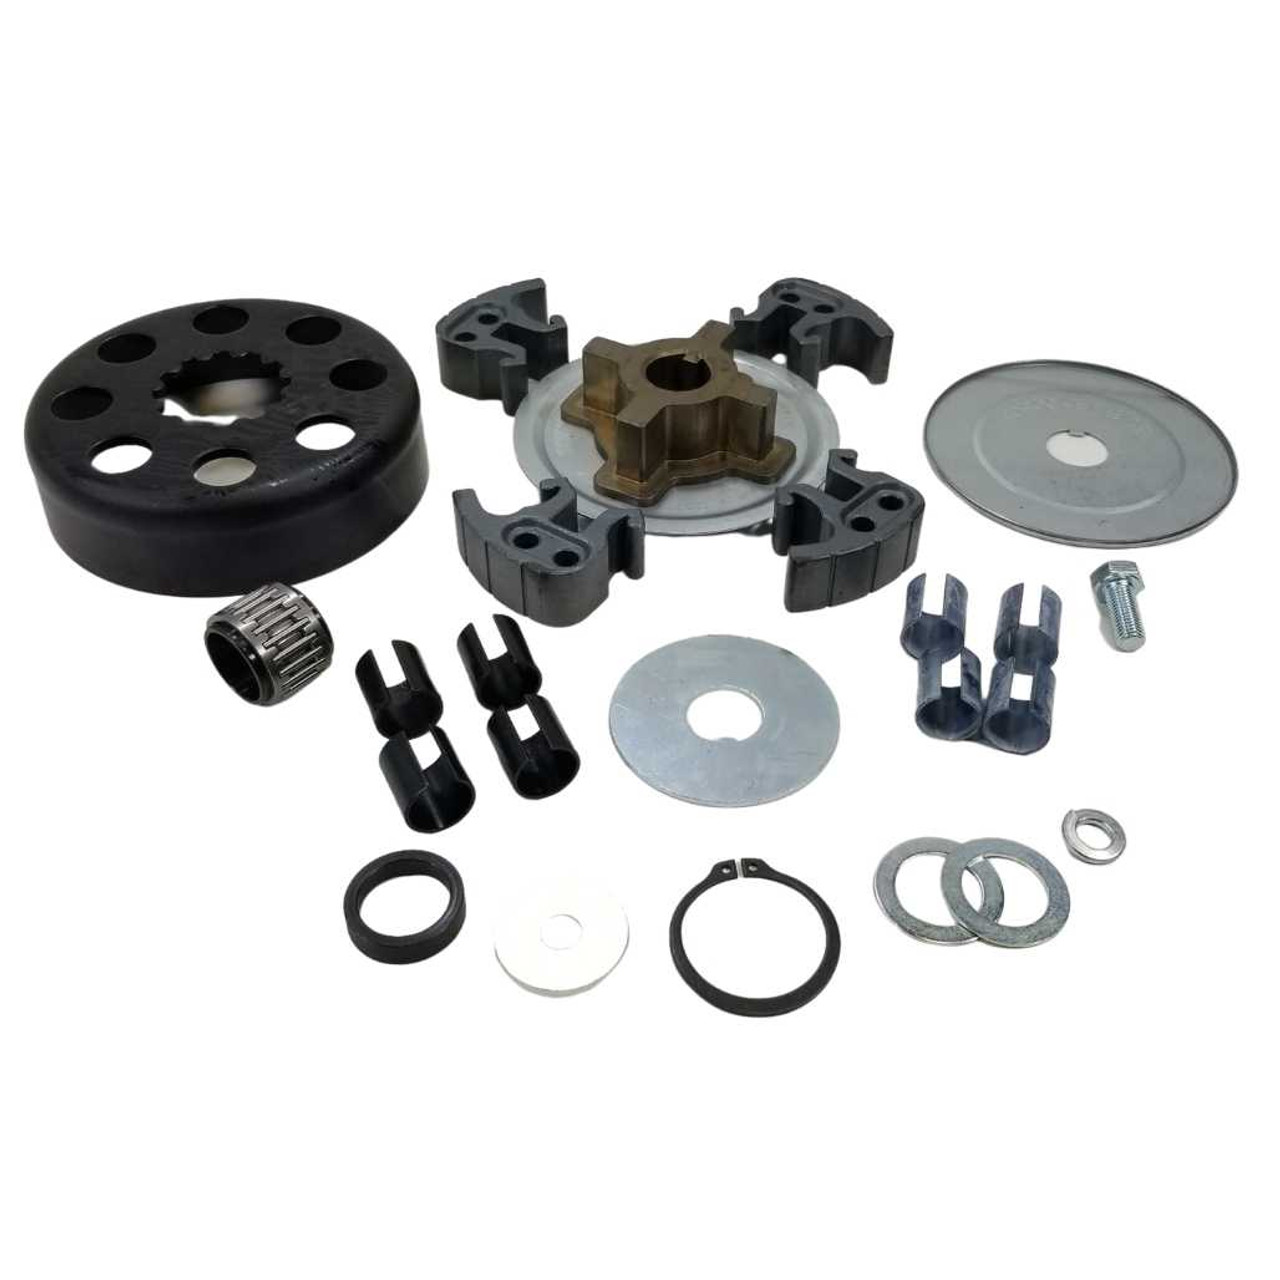 Hilliard Flame Racing Clutch parts